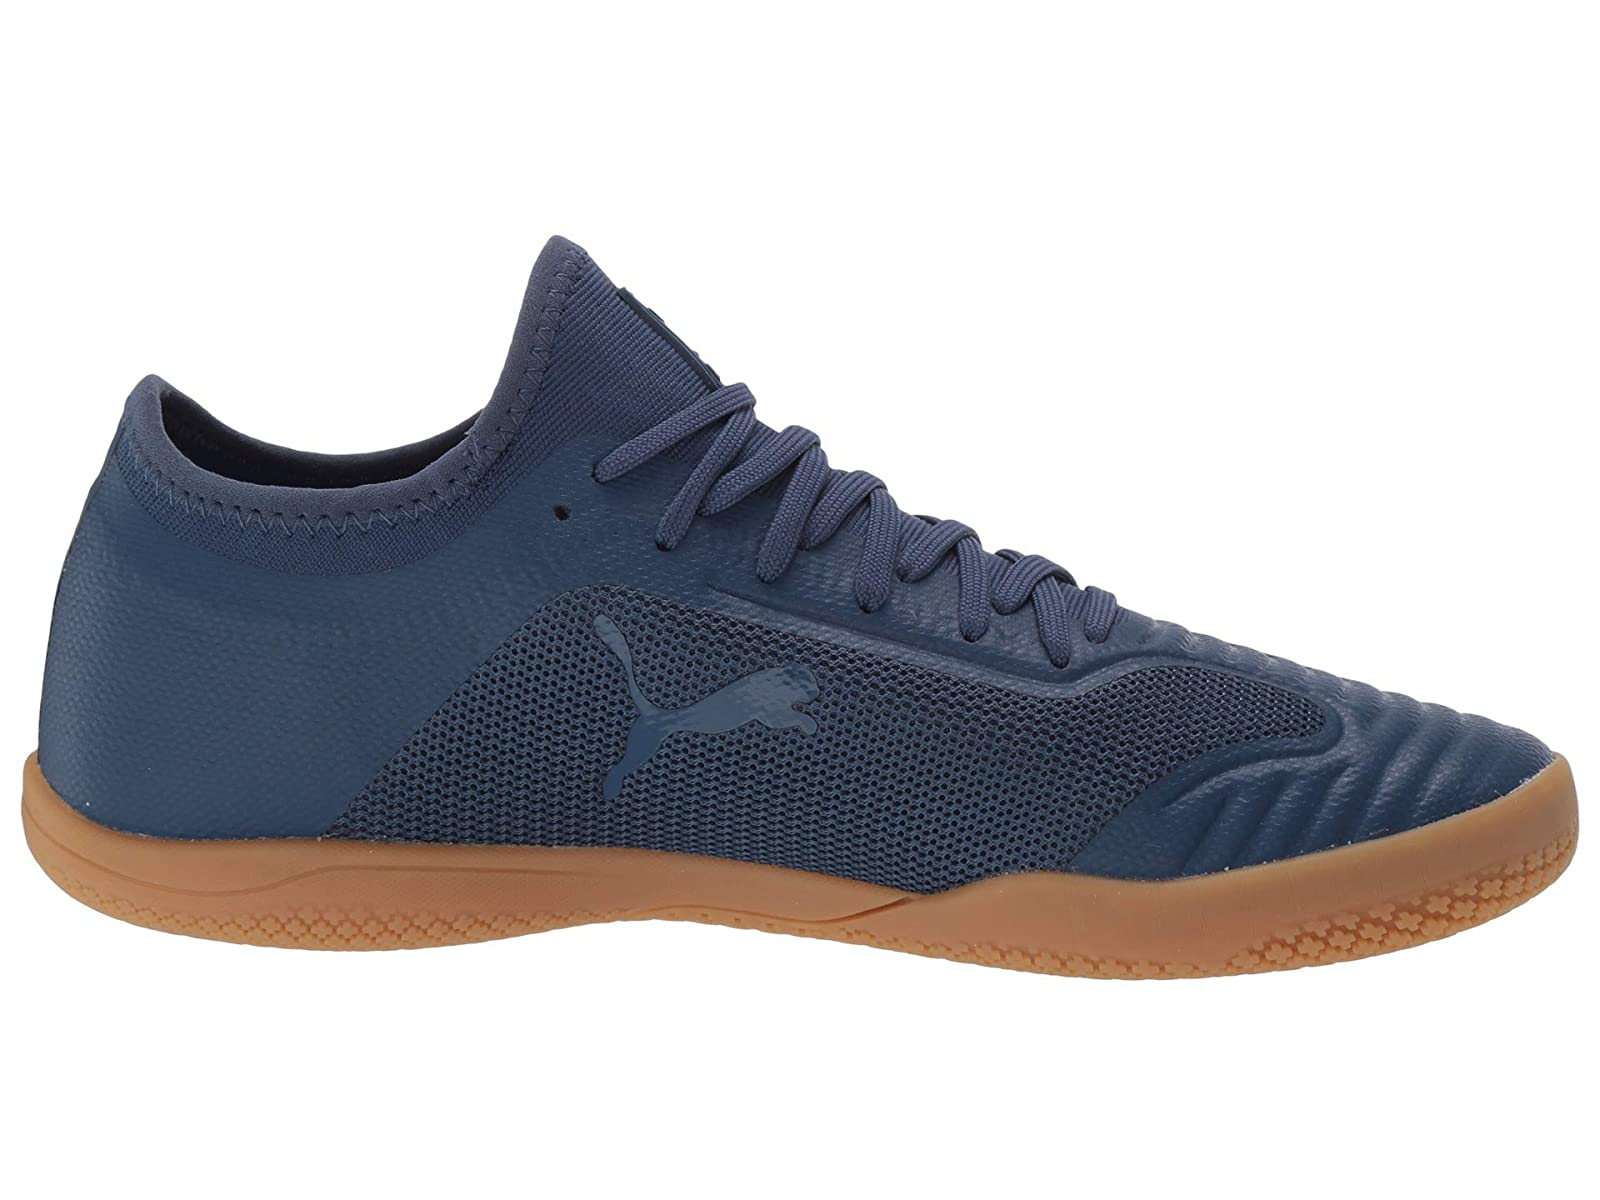 Man-039-s-Sneakers-amp-Athletic-Shoes-PUMA-365-Sala-1 thumbnail 7